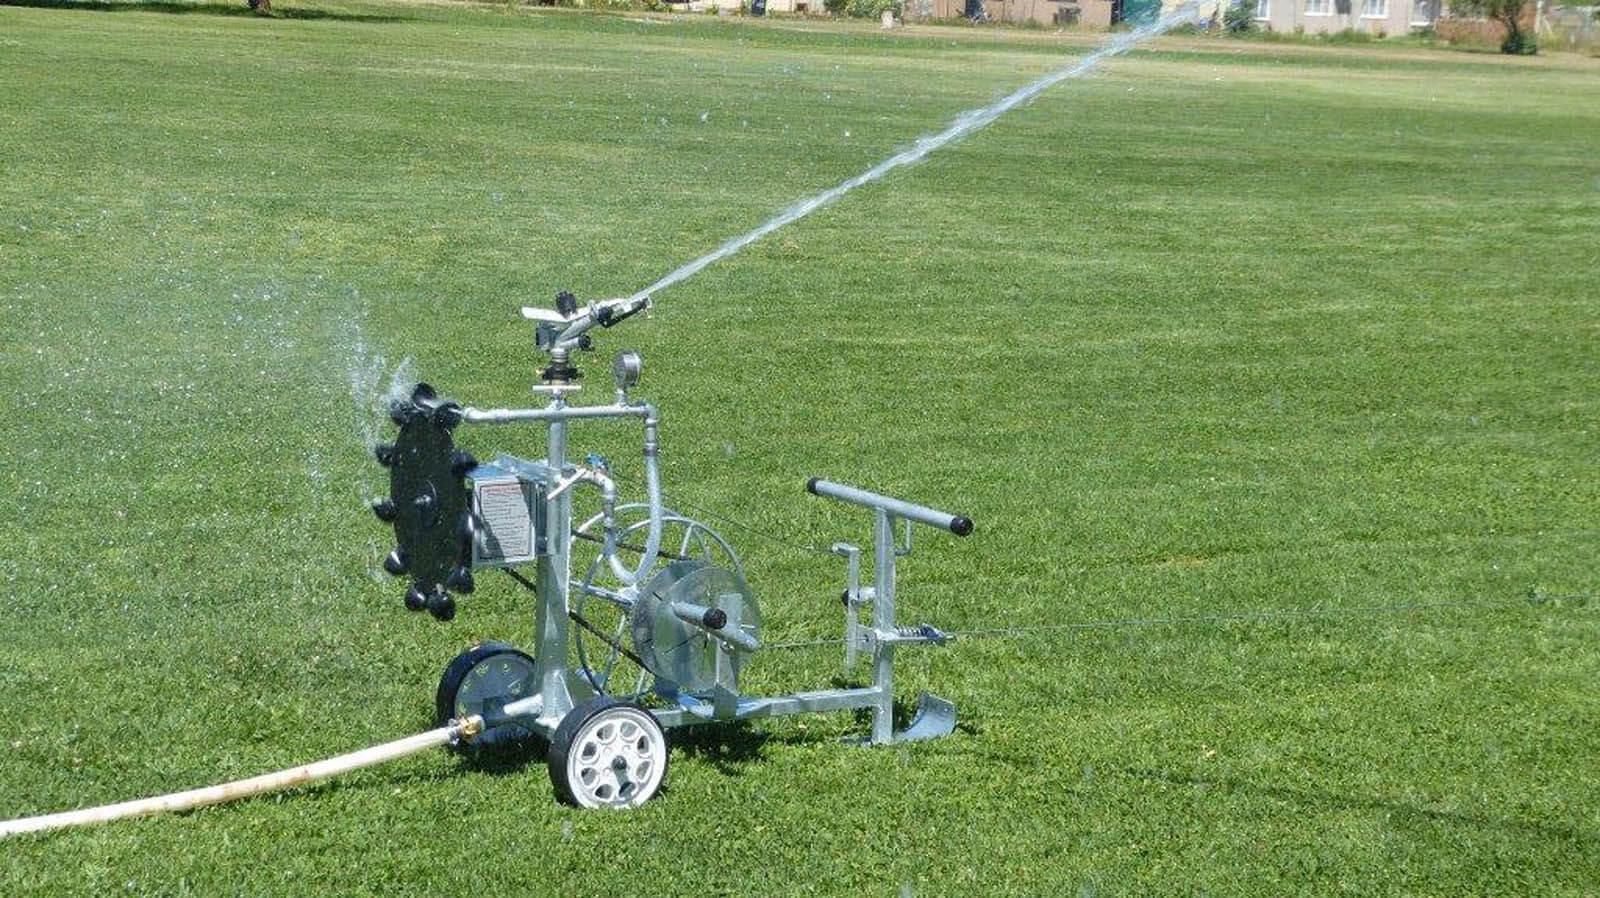 Sportsman 120 Irrigation System Rotrix Africa Rainmaker